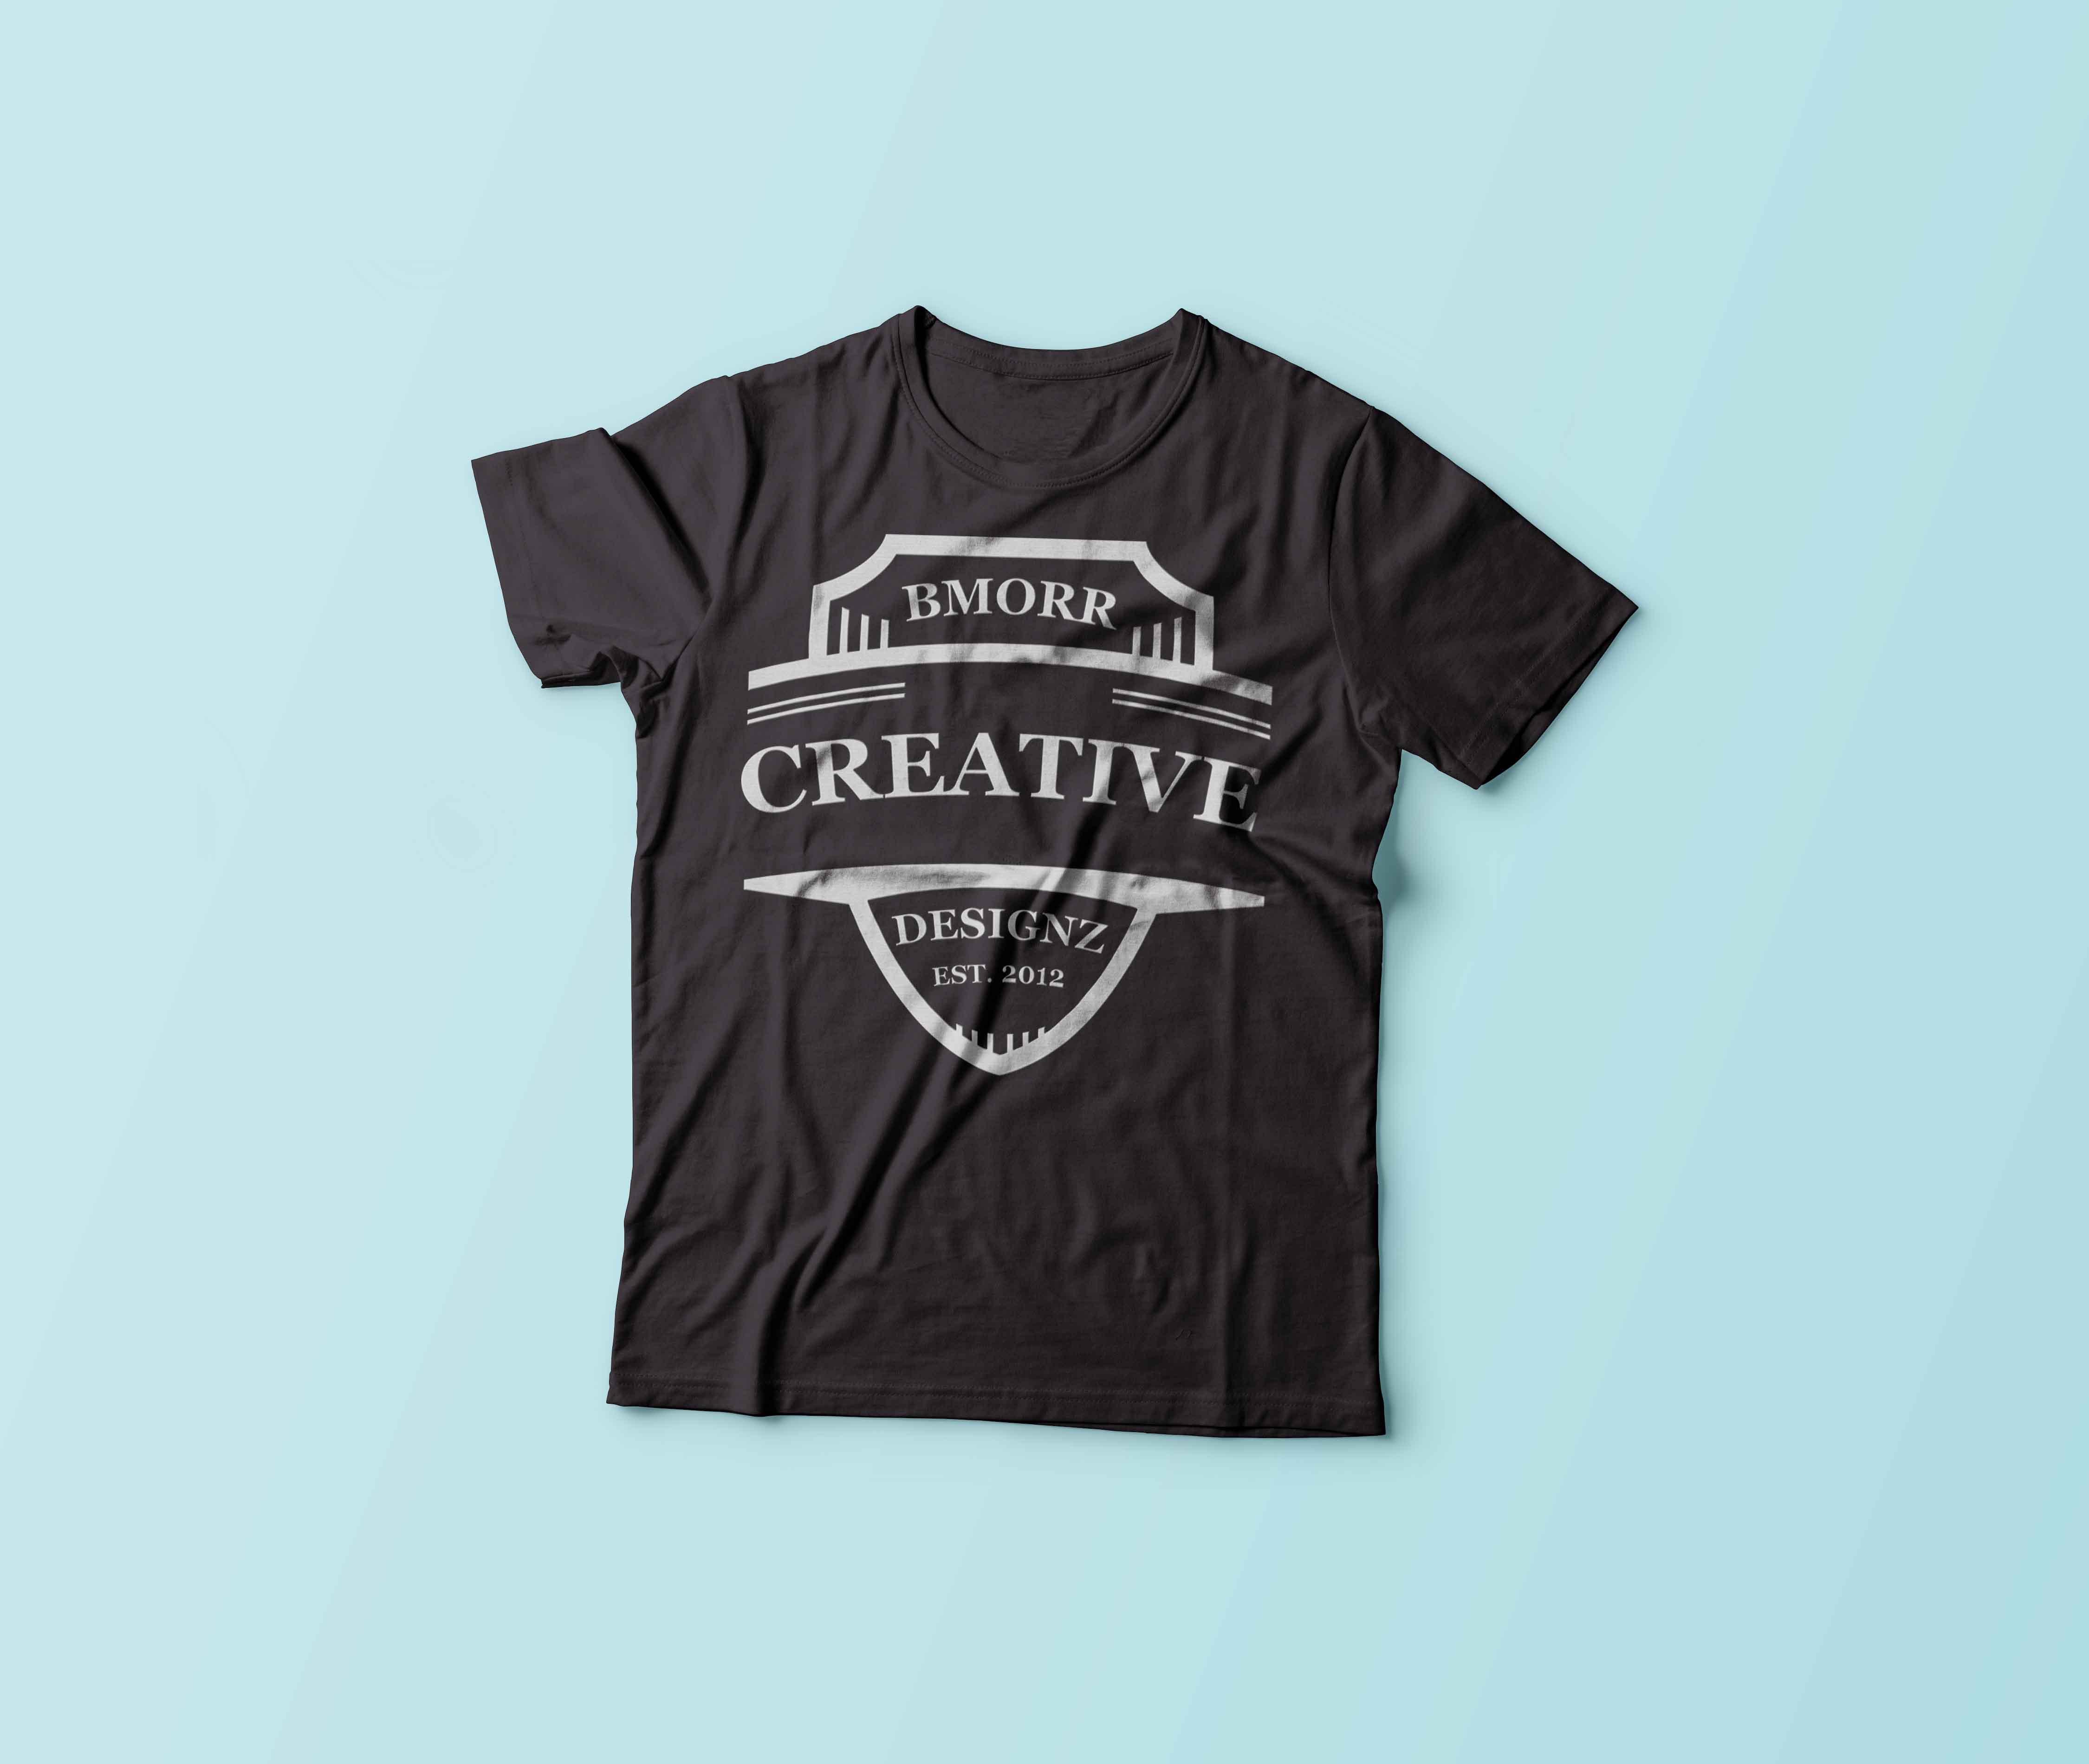 Bmorr Creative Designz